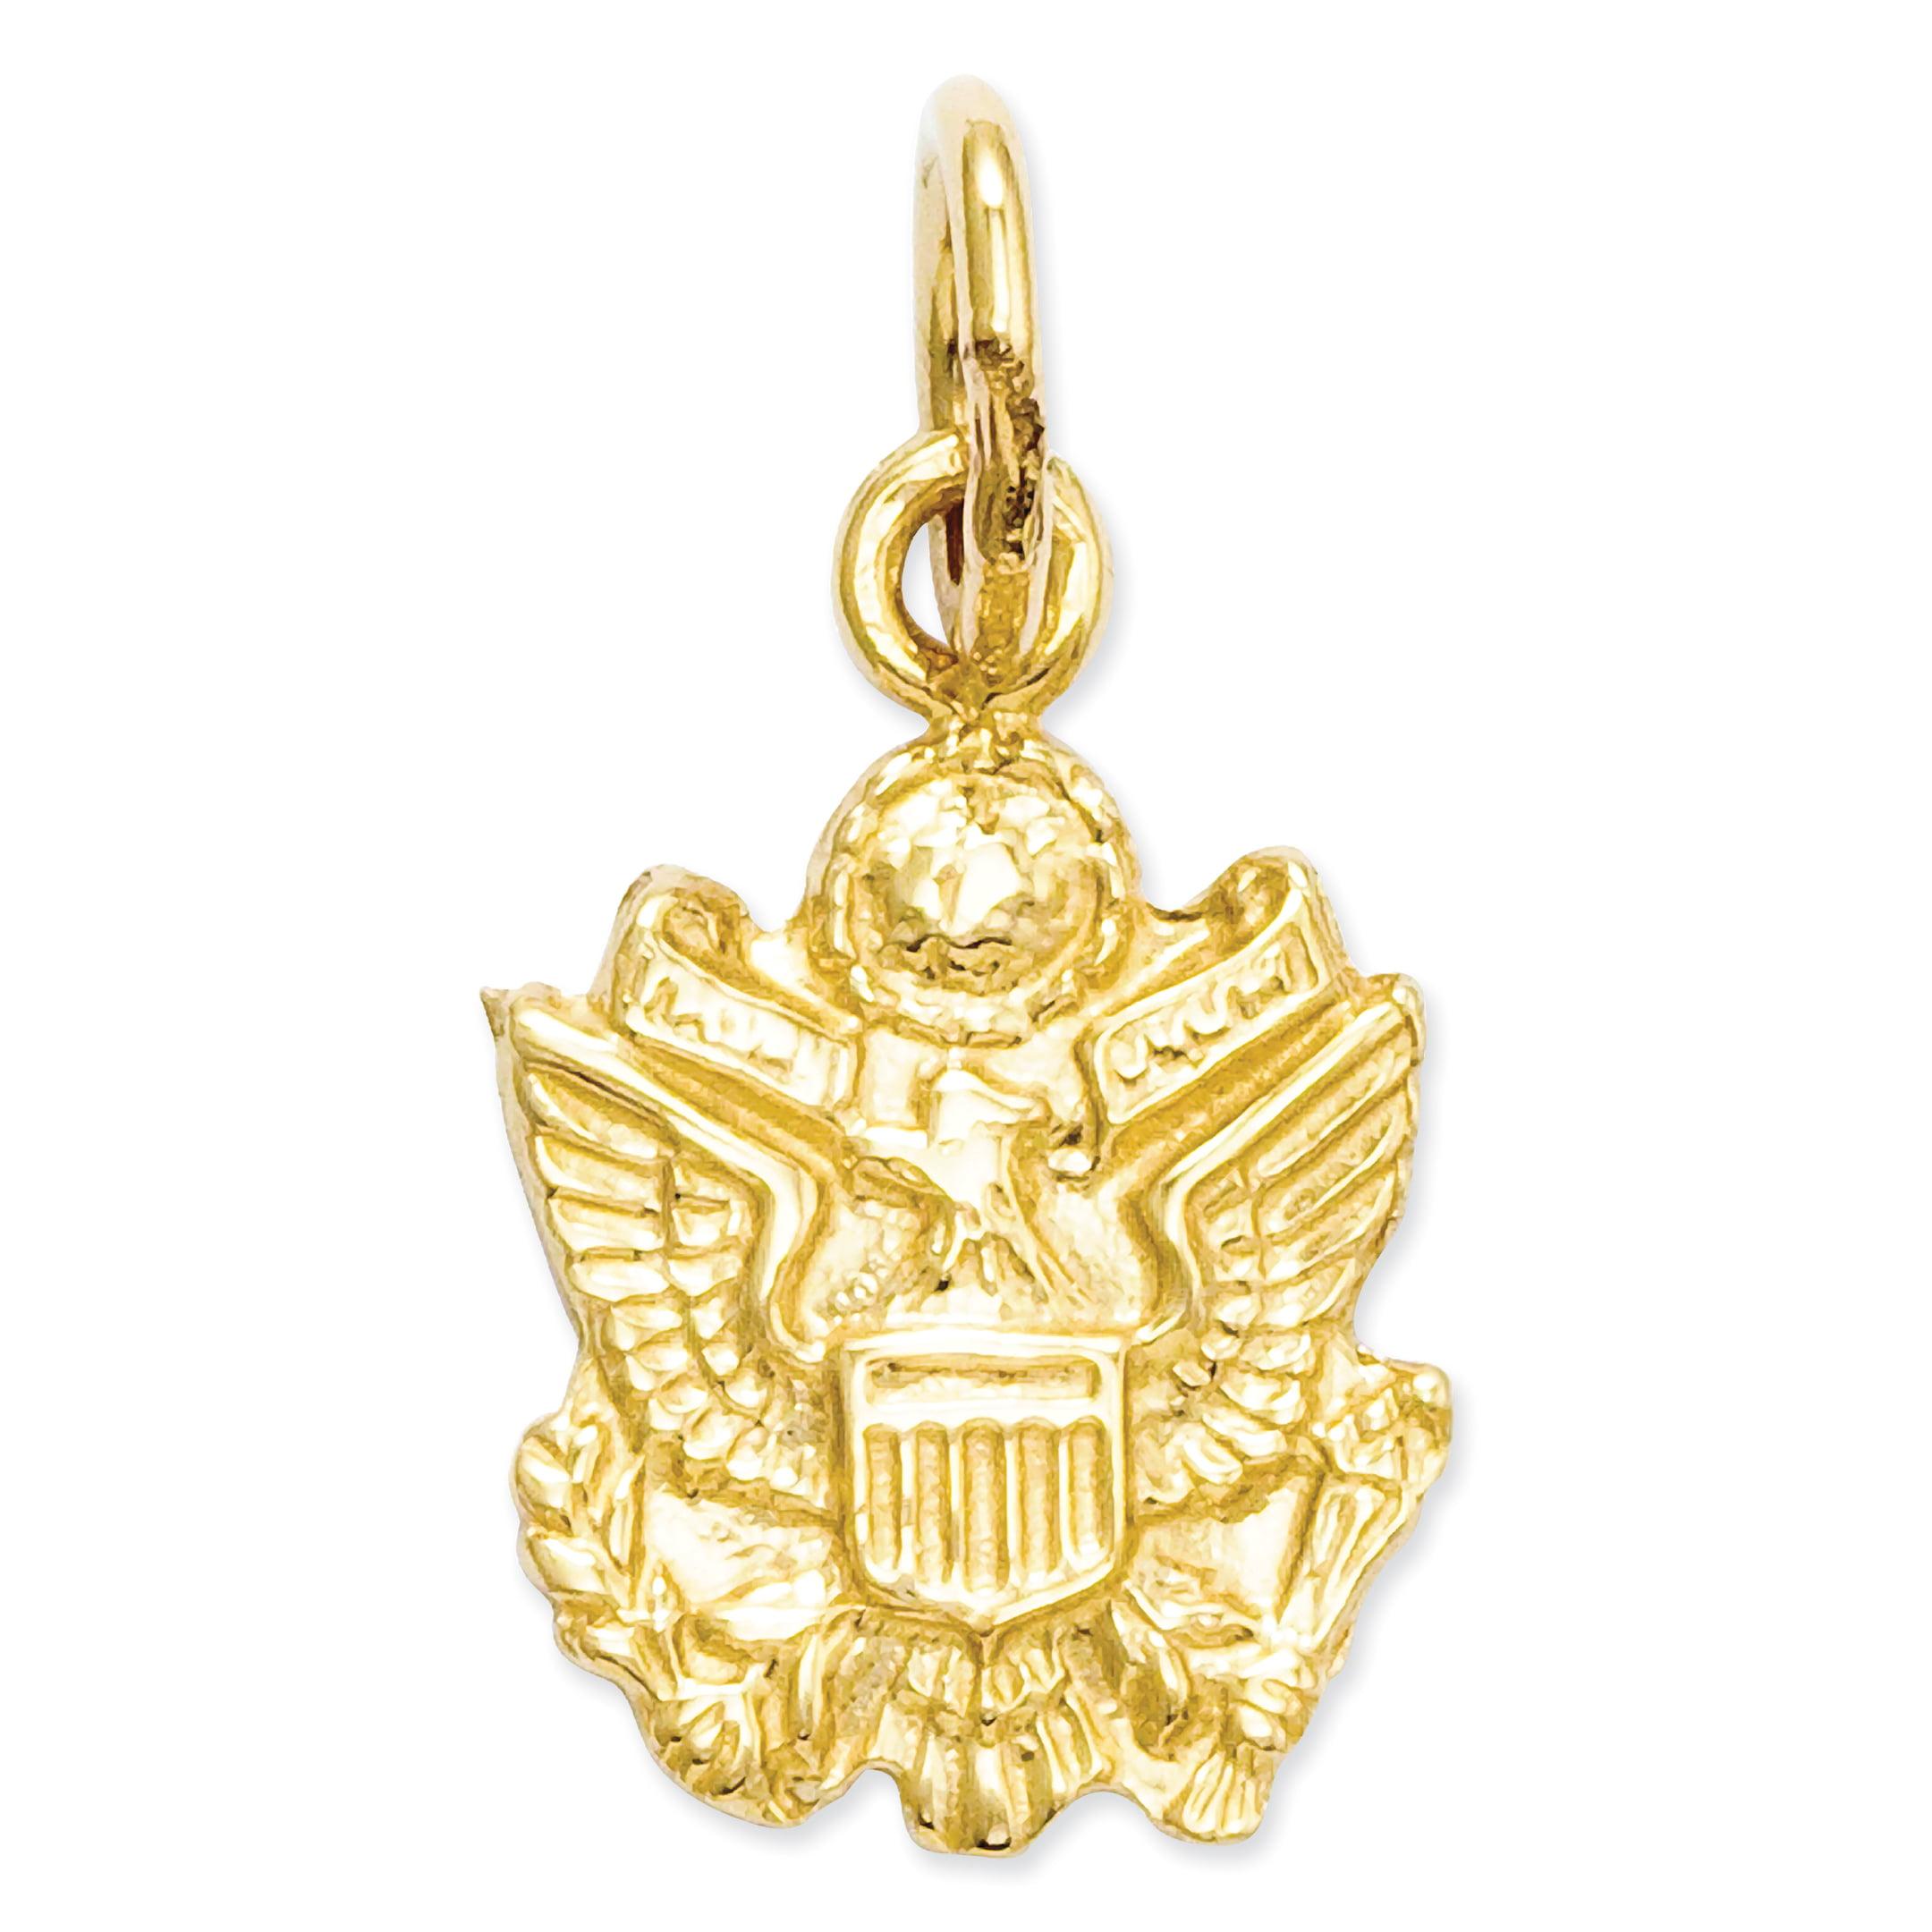 14k U. S. Army Insignia Charm A0223 (16.5mm x 9mm) - image 3 de 3